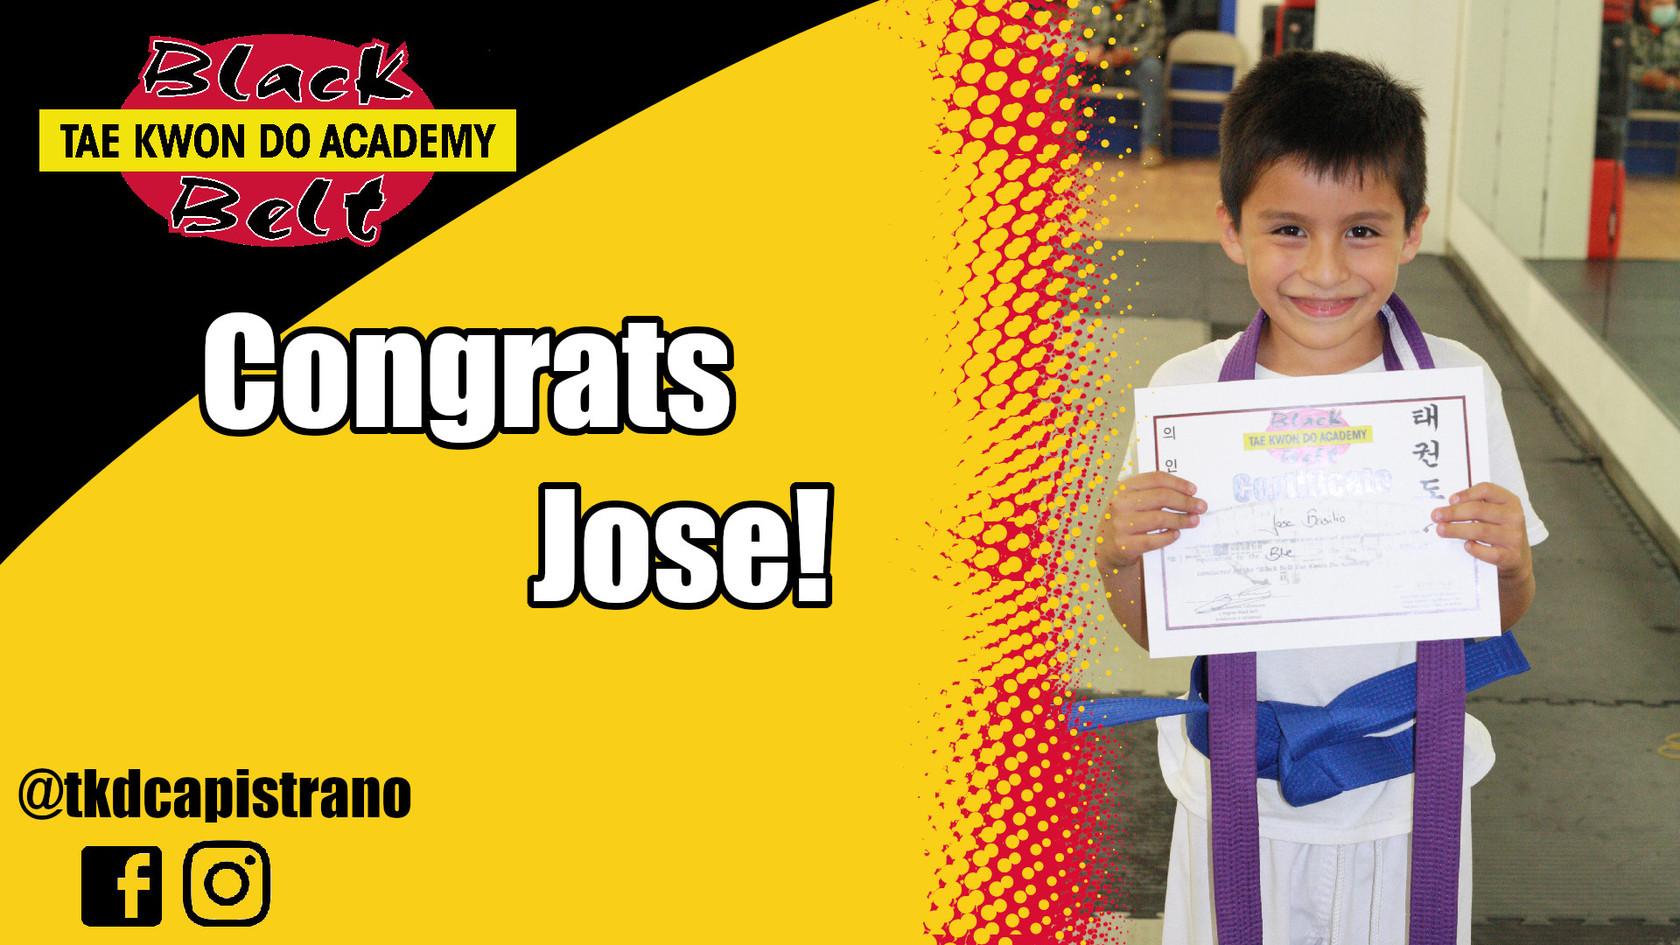 Congrats Jose!